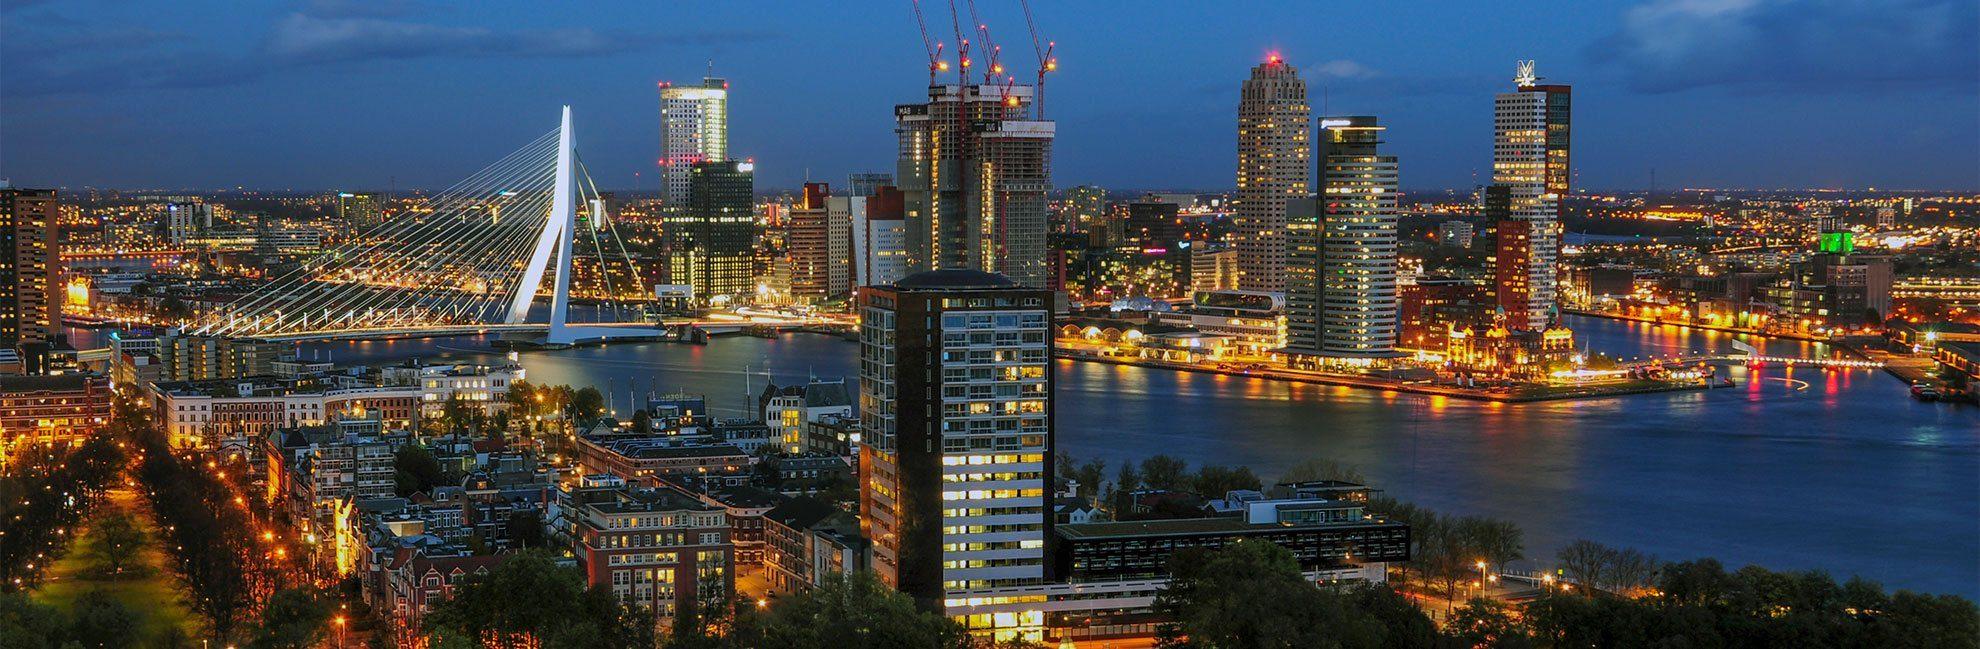 Rotterdam-Ideo-Design